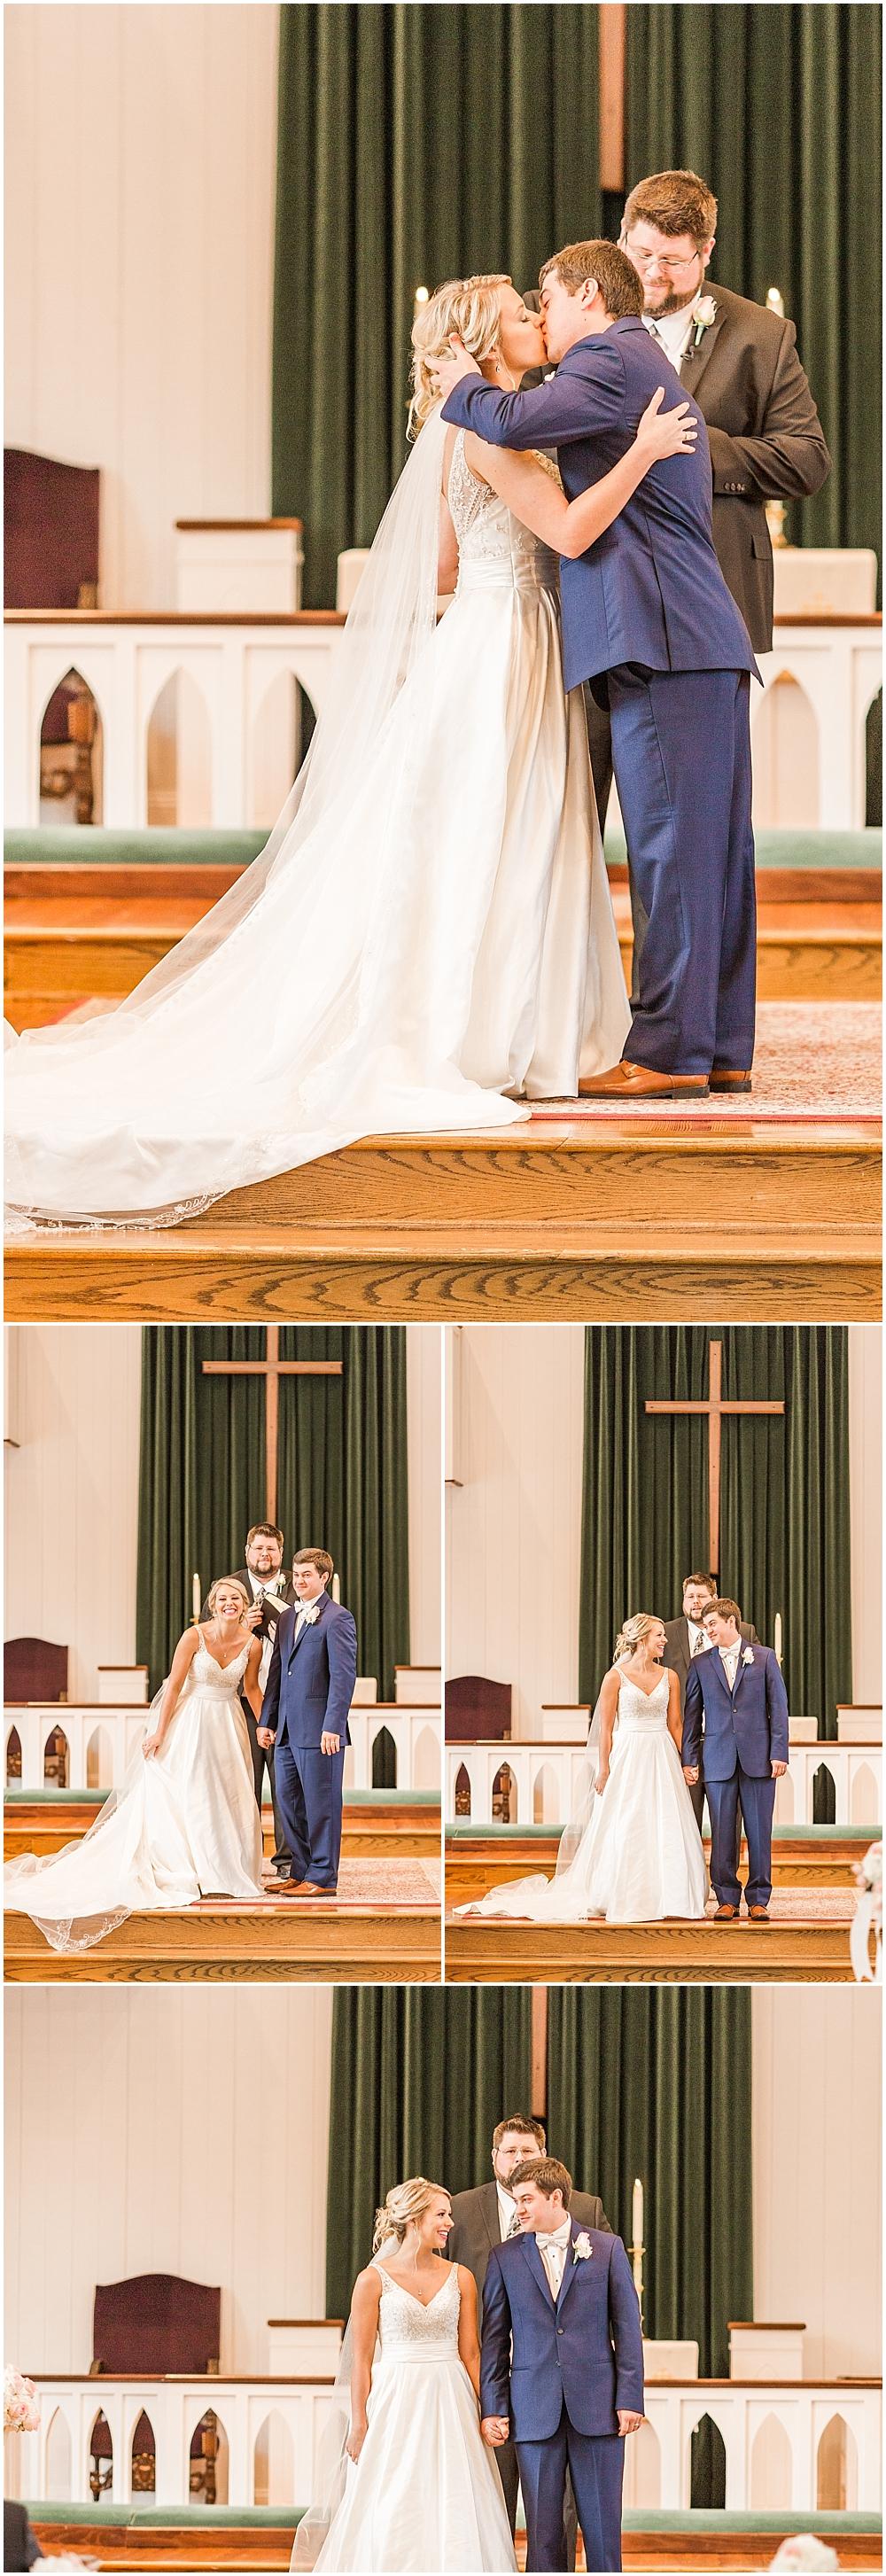 Ashton-Clark-Photography-Wedding-Portrait-Family-Photographer-Mobile-Alabama_0337.jpg